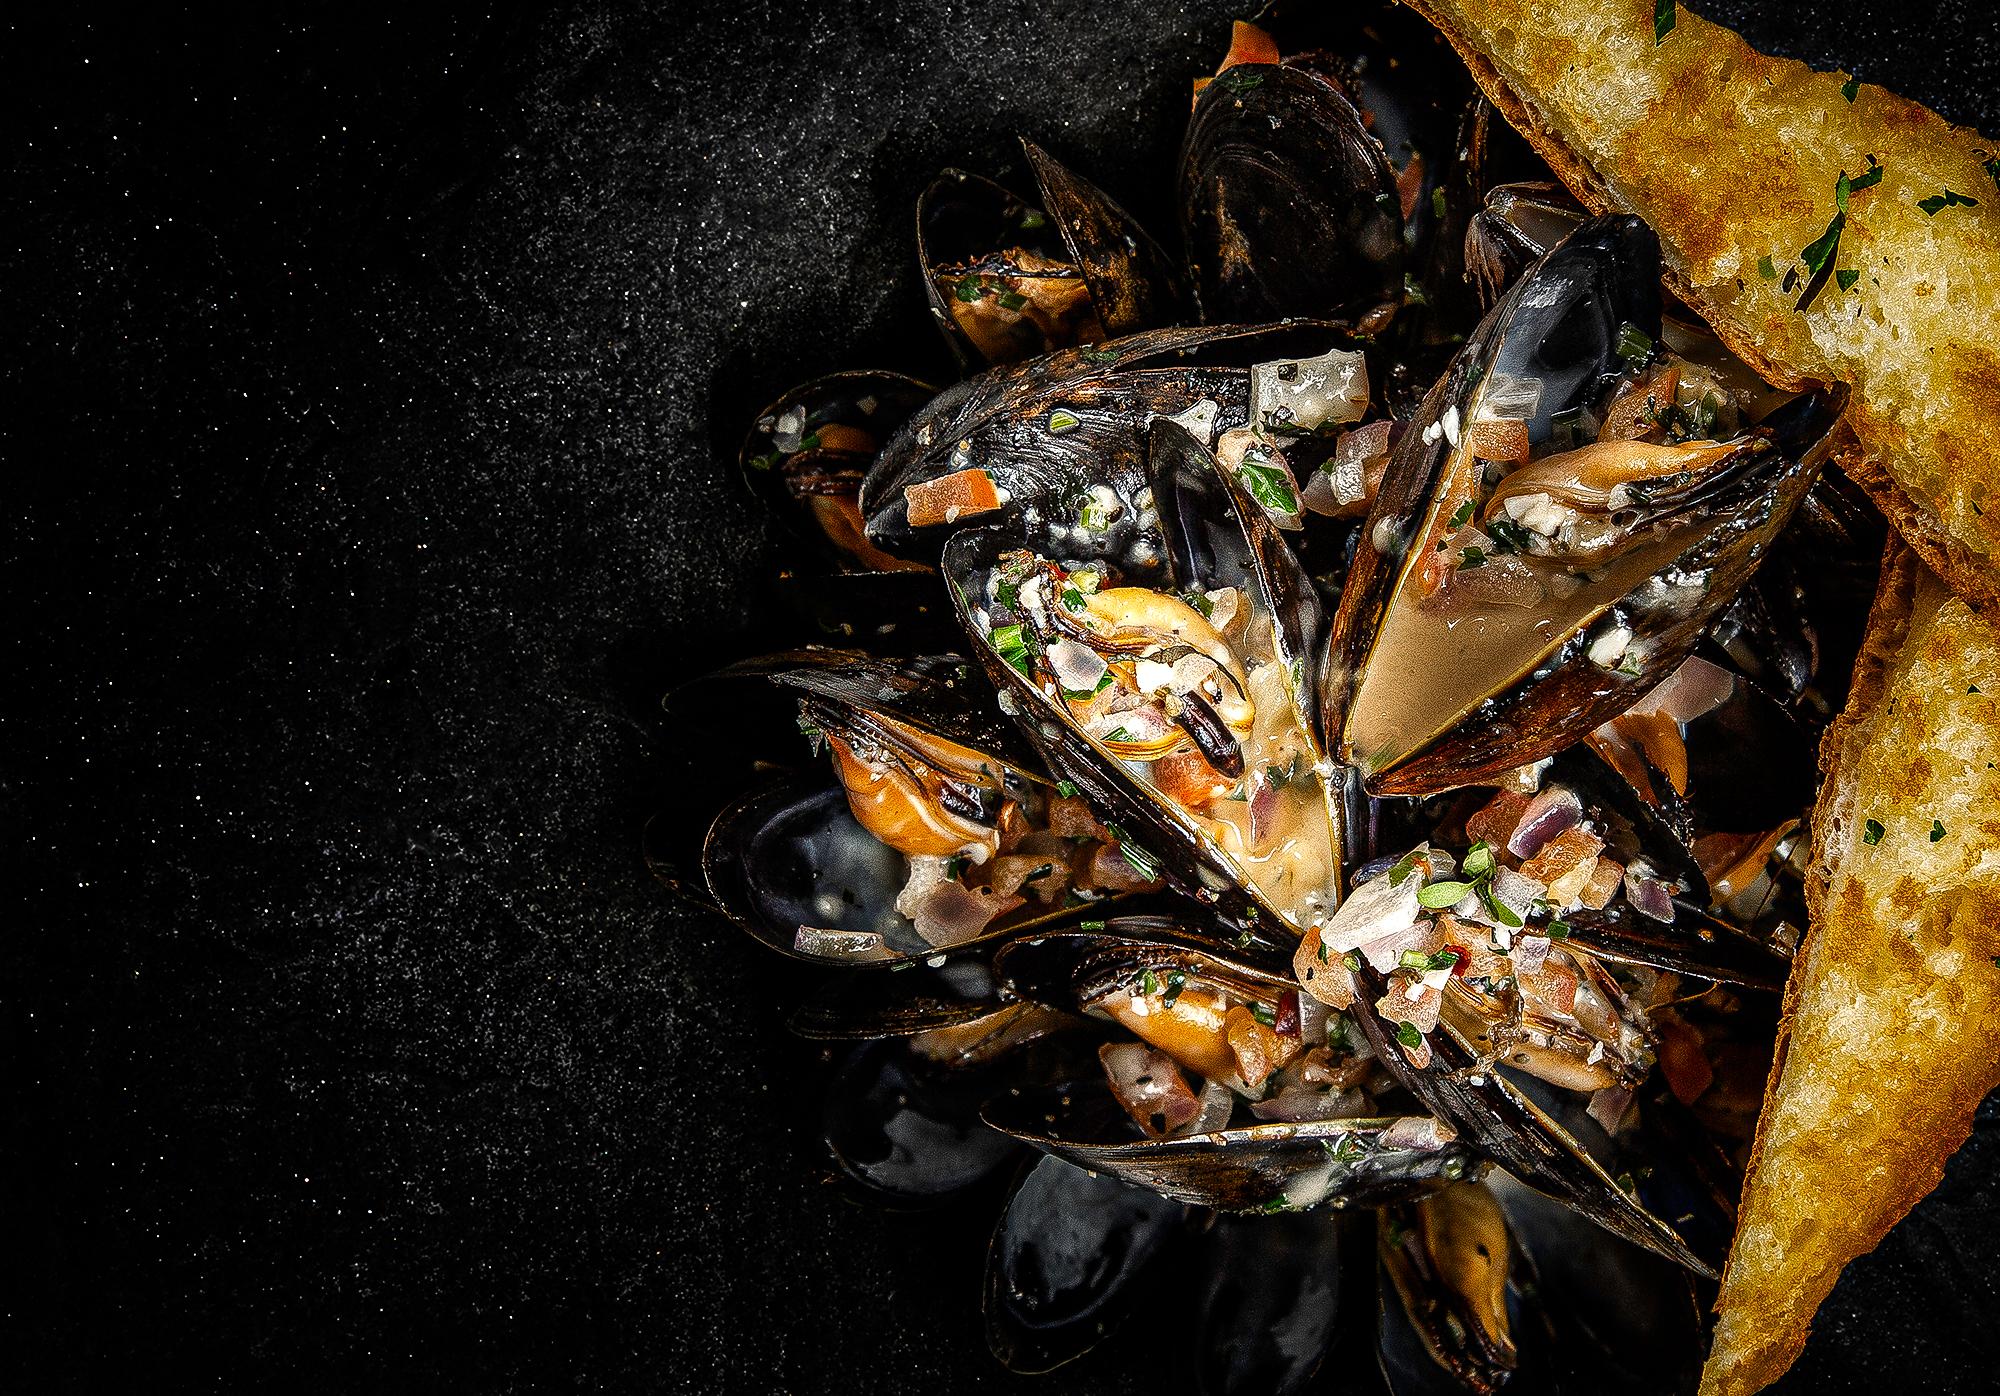 Seafood Fotografie fur Hilton Hotels; Professionelle Foodfotograf Adrian Kilchherr aus Schweiz